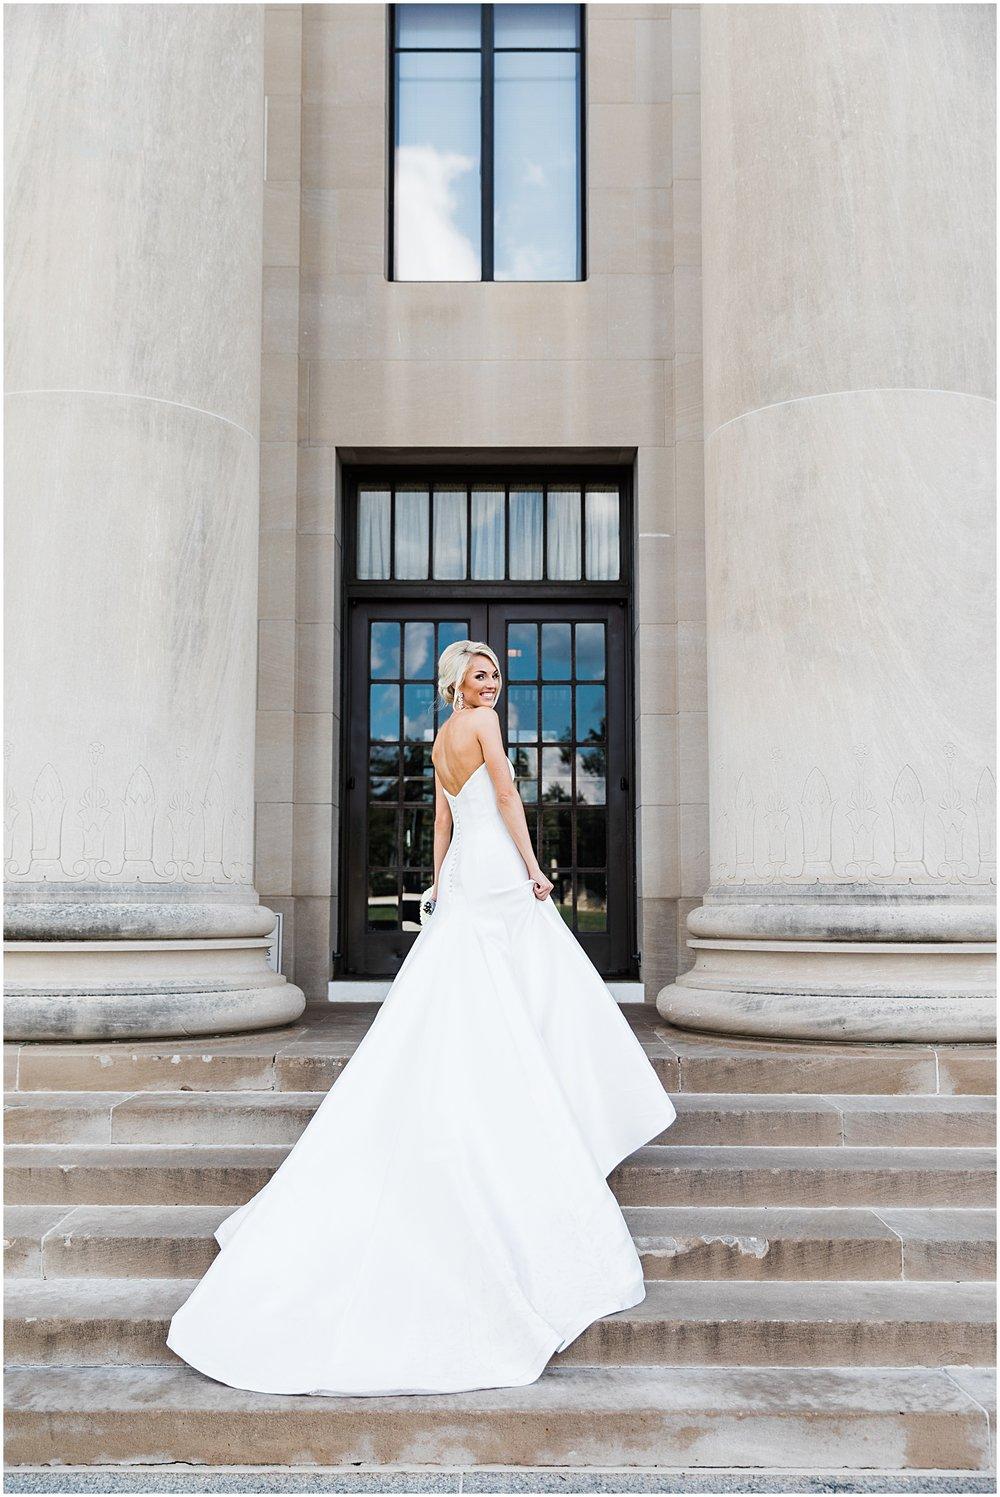 NOLL WEDDING | THE BRASS ON BALTIMORE | MARISSA CRIBBS PHOTOGRAPHY_6320.jpg